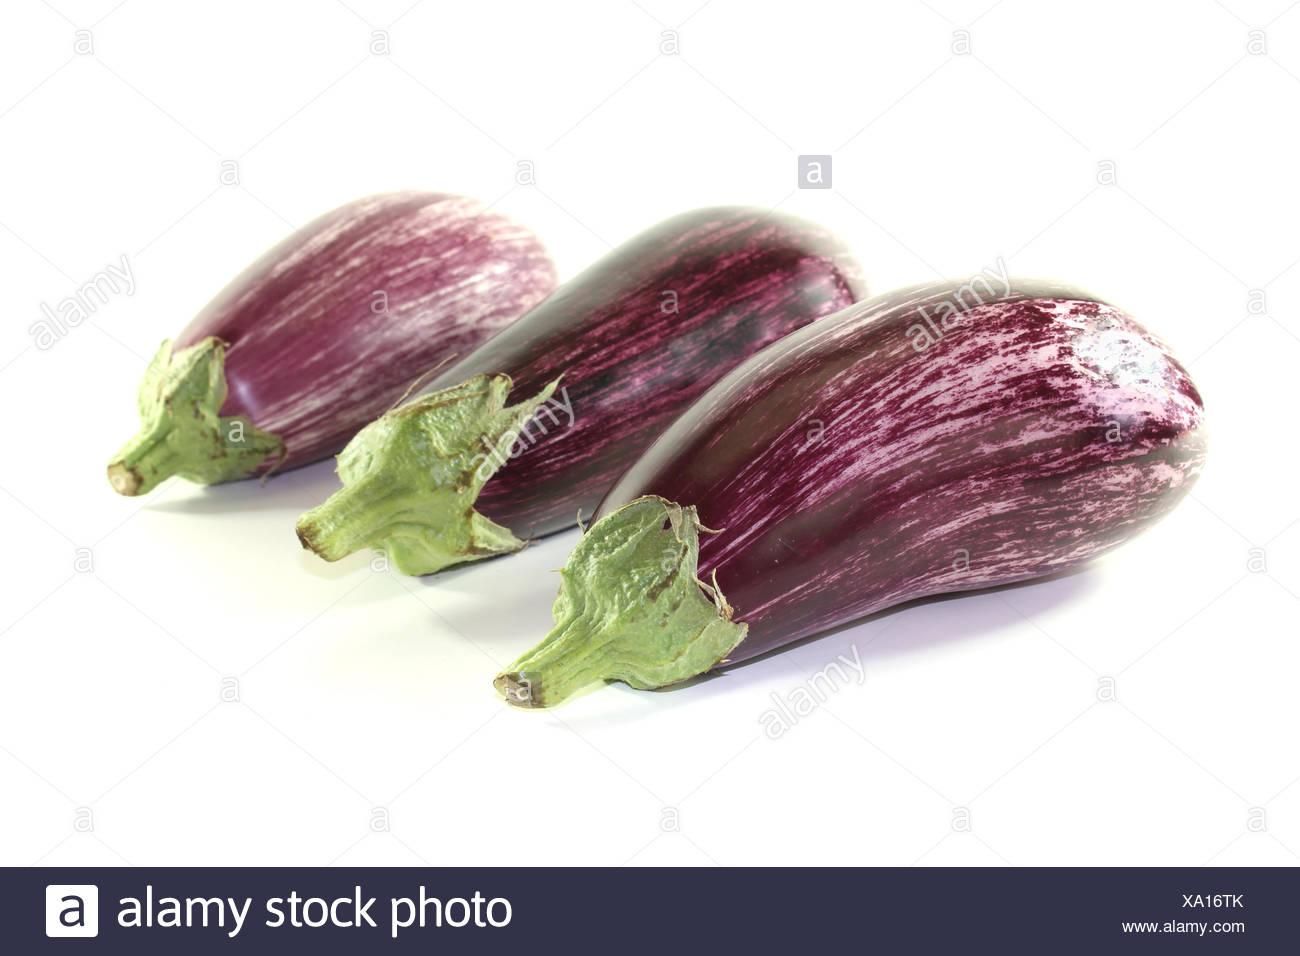 eggplant - Stock Image